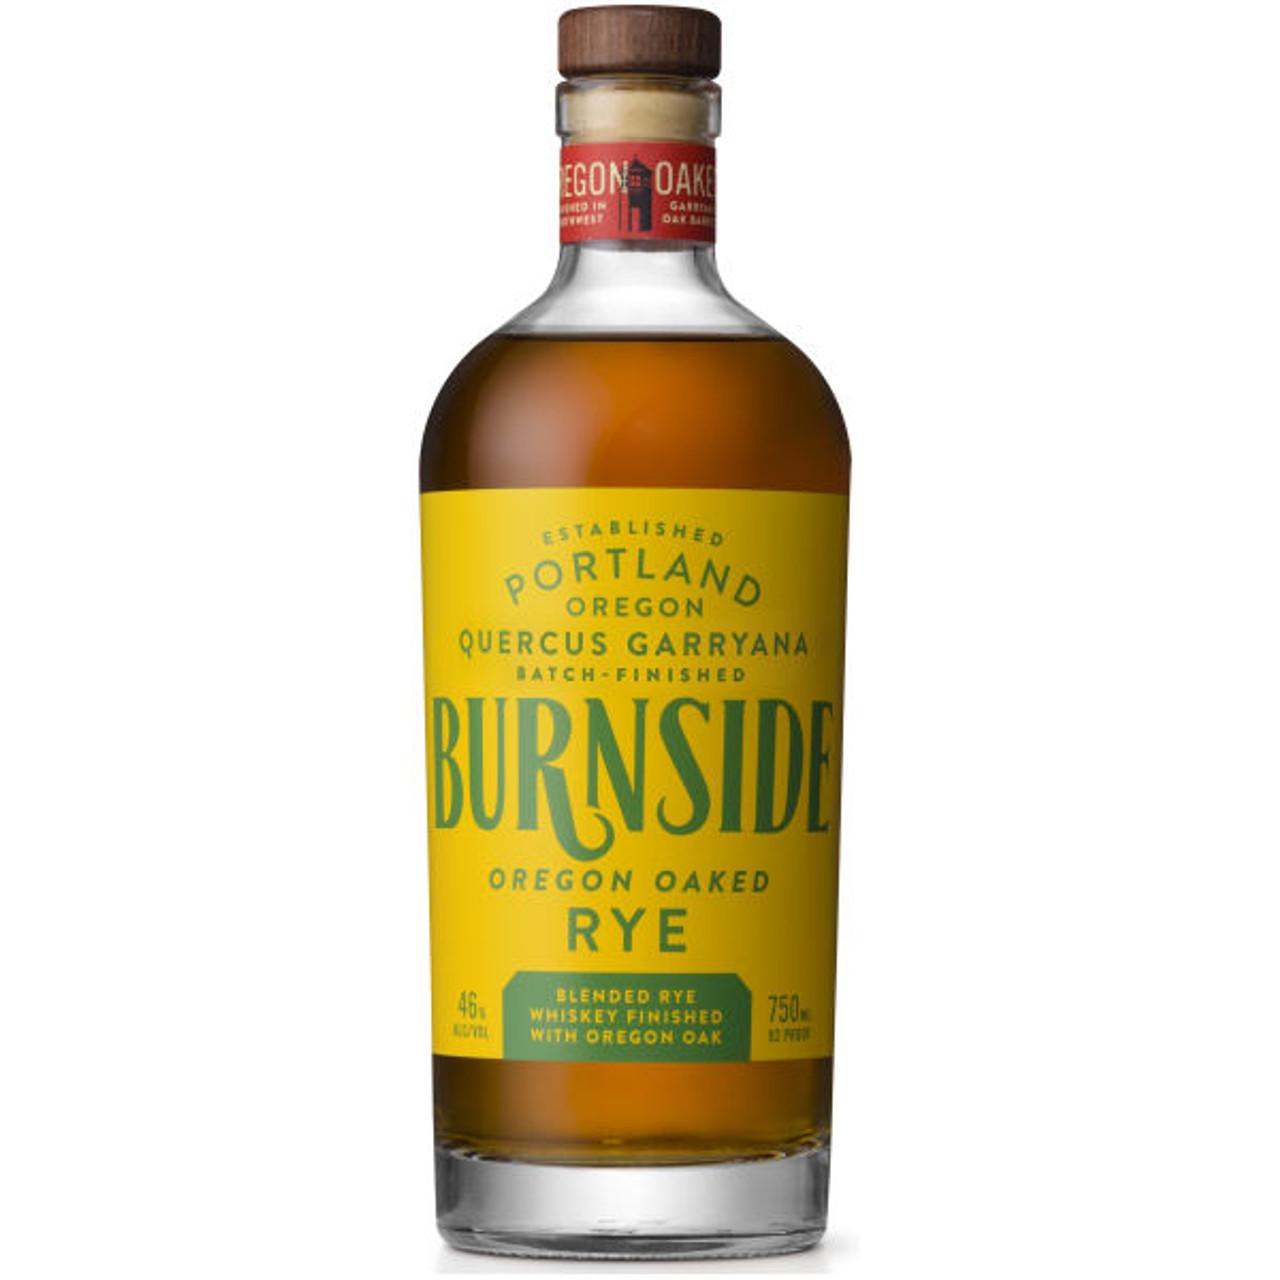 Burnside Oregon Oaked Rye Whiskey 750ml